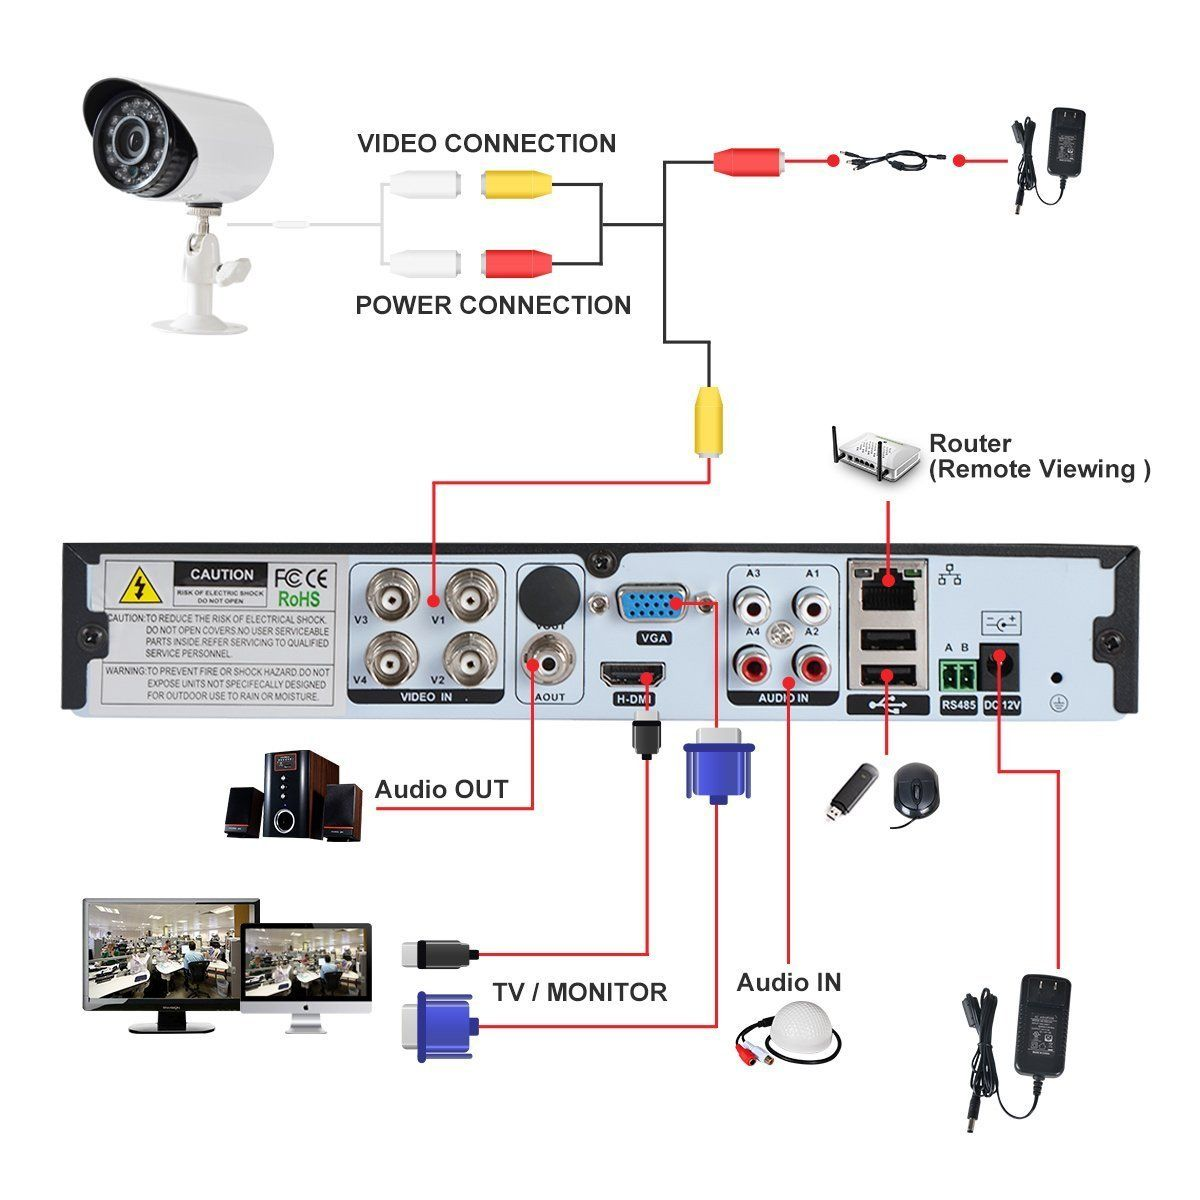 Amazon : JOOAN TC404AHD4A 4CH AHD 720P CCTV Cameras Surveillance Security Camera System